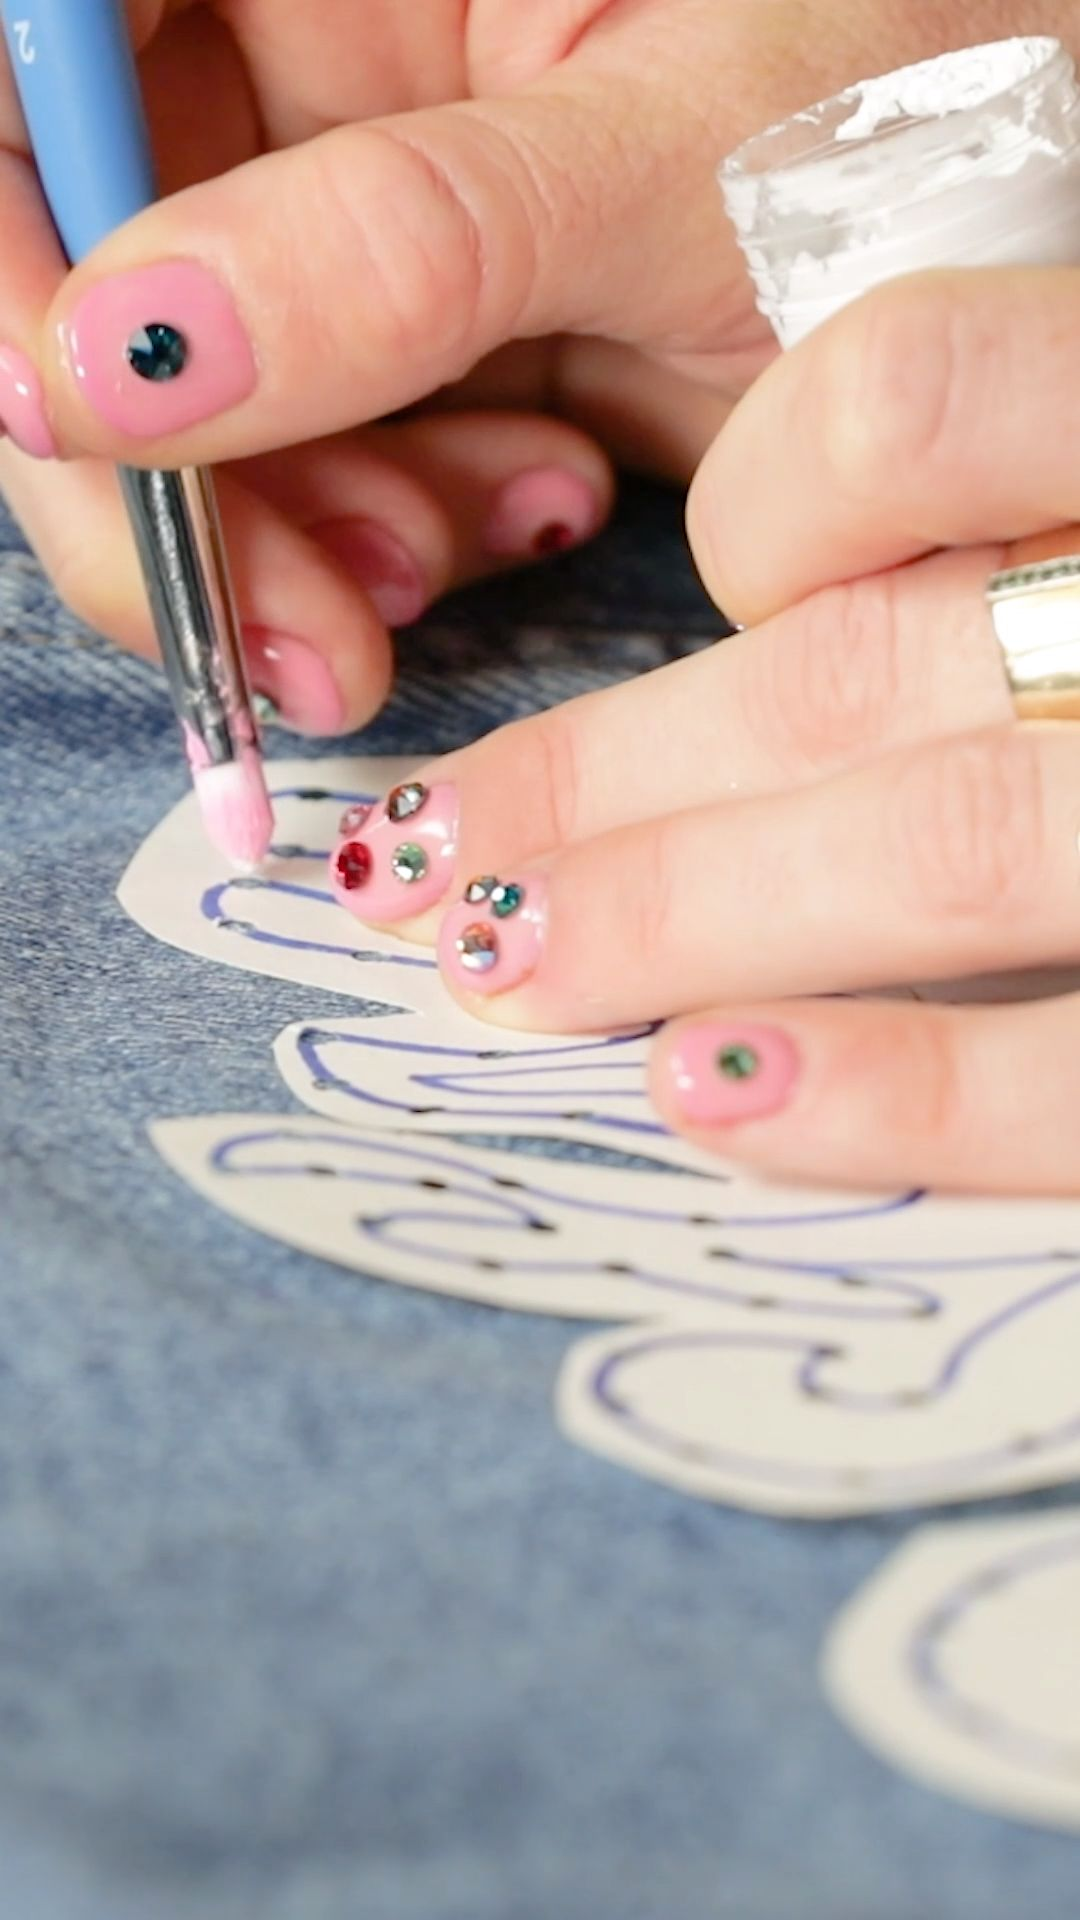 DIY Denim Jacket Embroidery